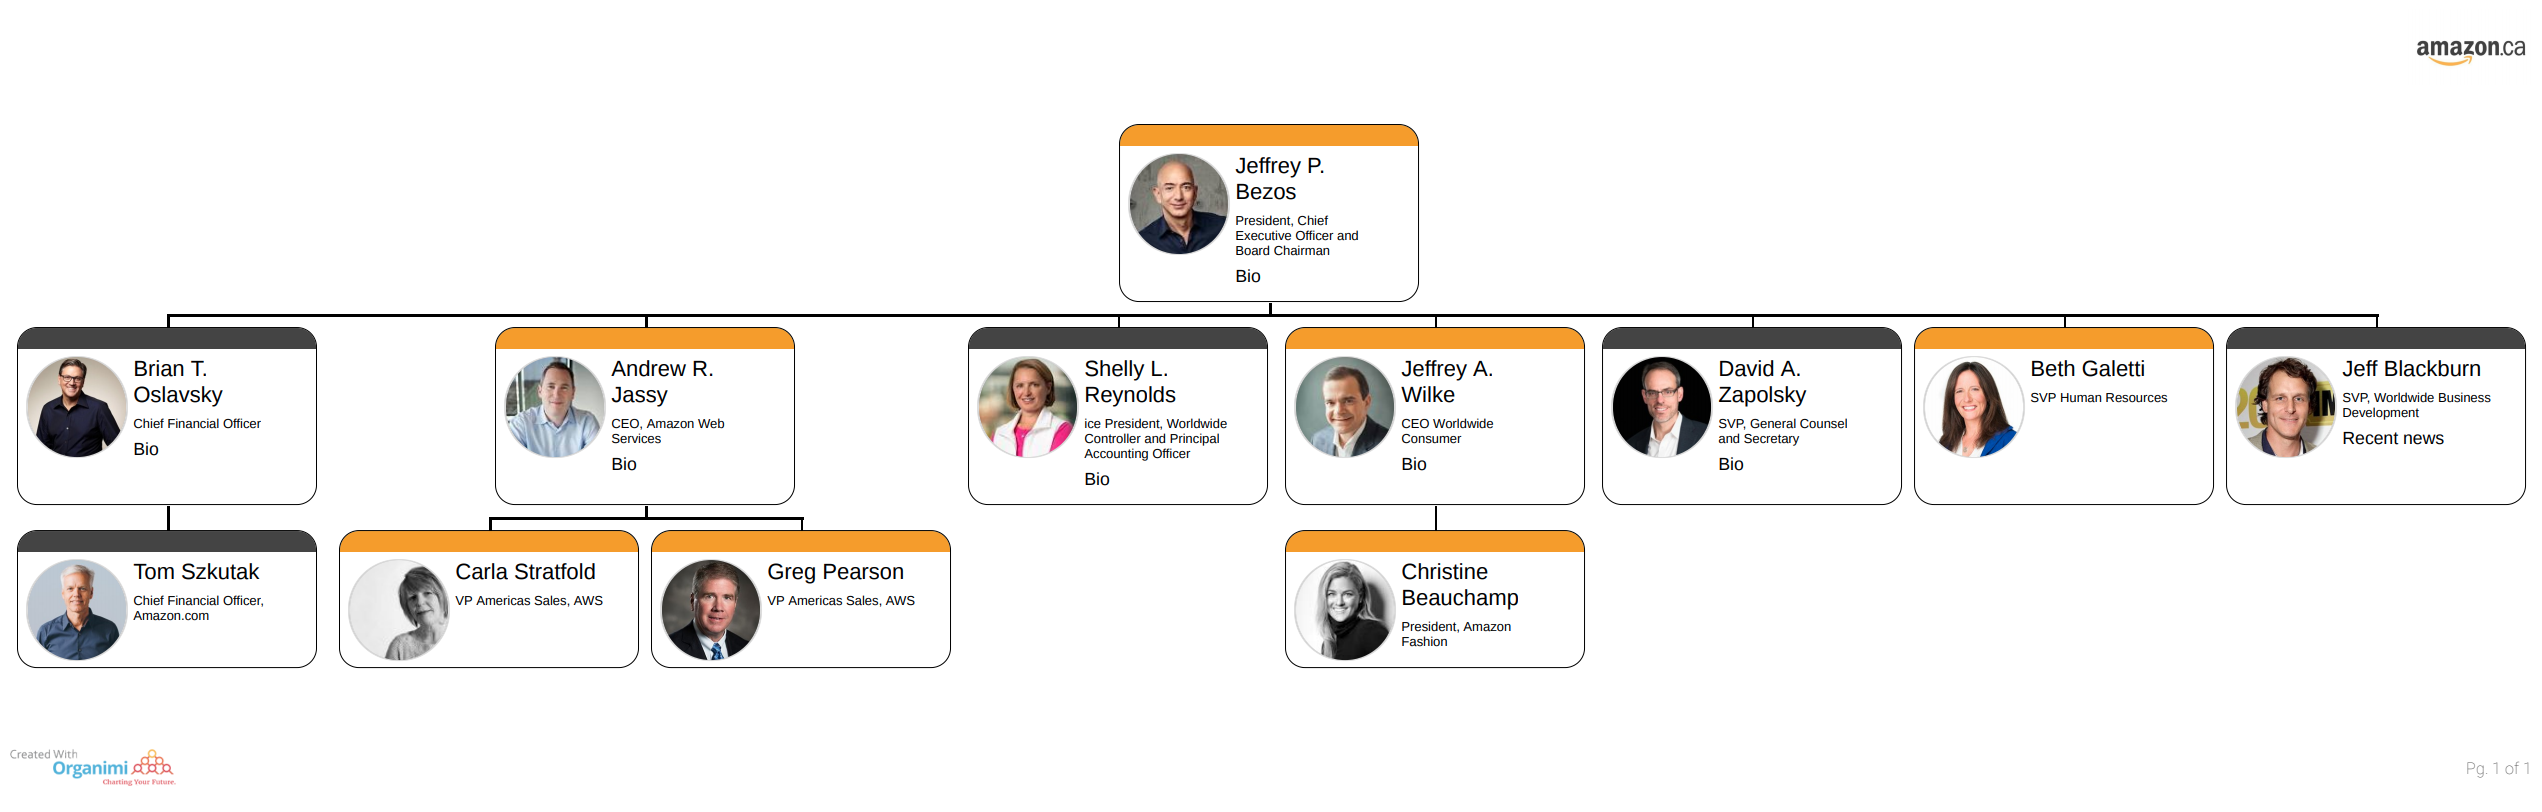 Amazon's Organizational Structure